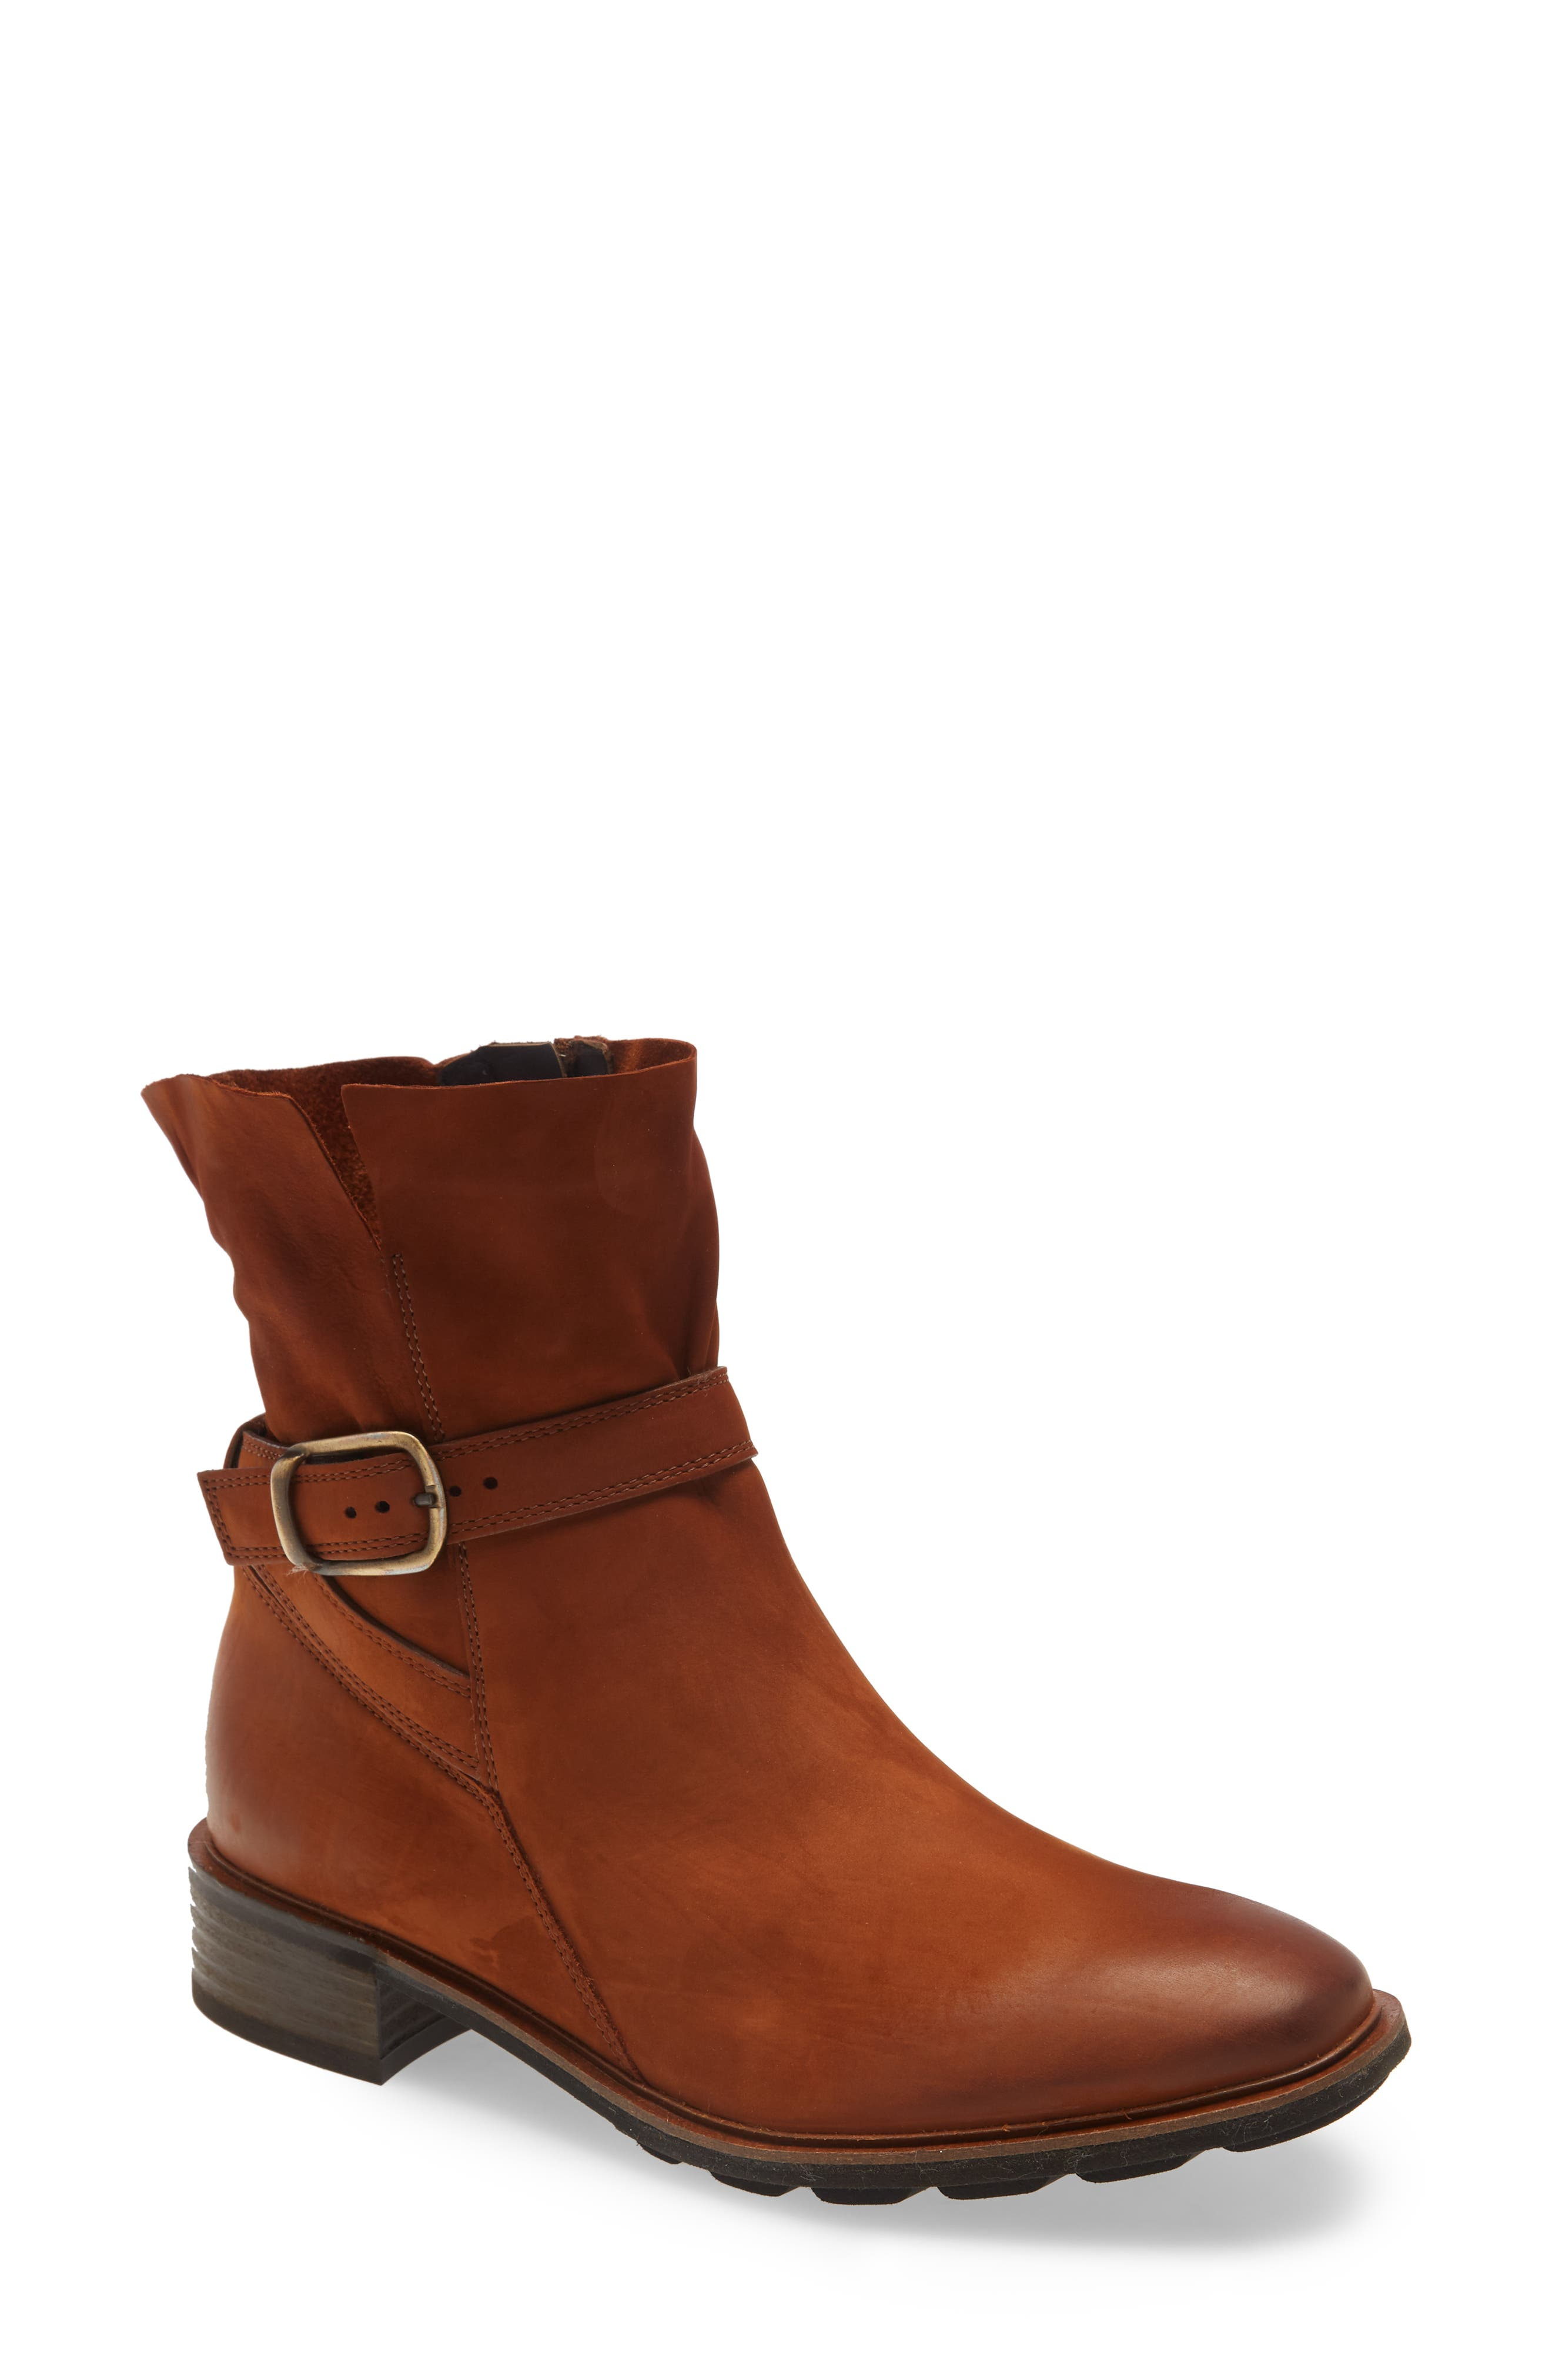 Paul Green Shoes Sale \u0026 Clearance